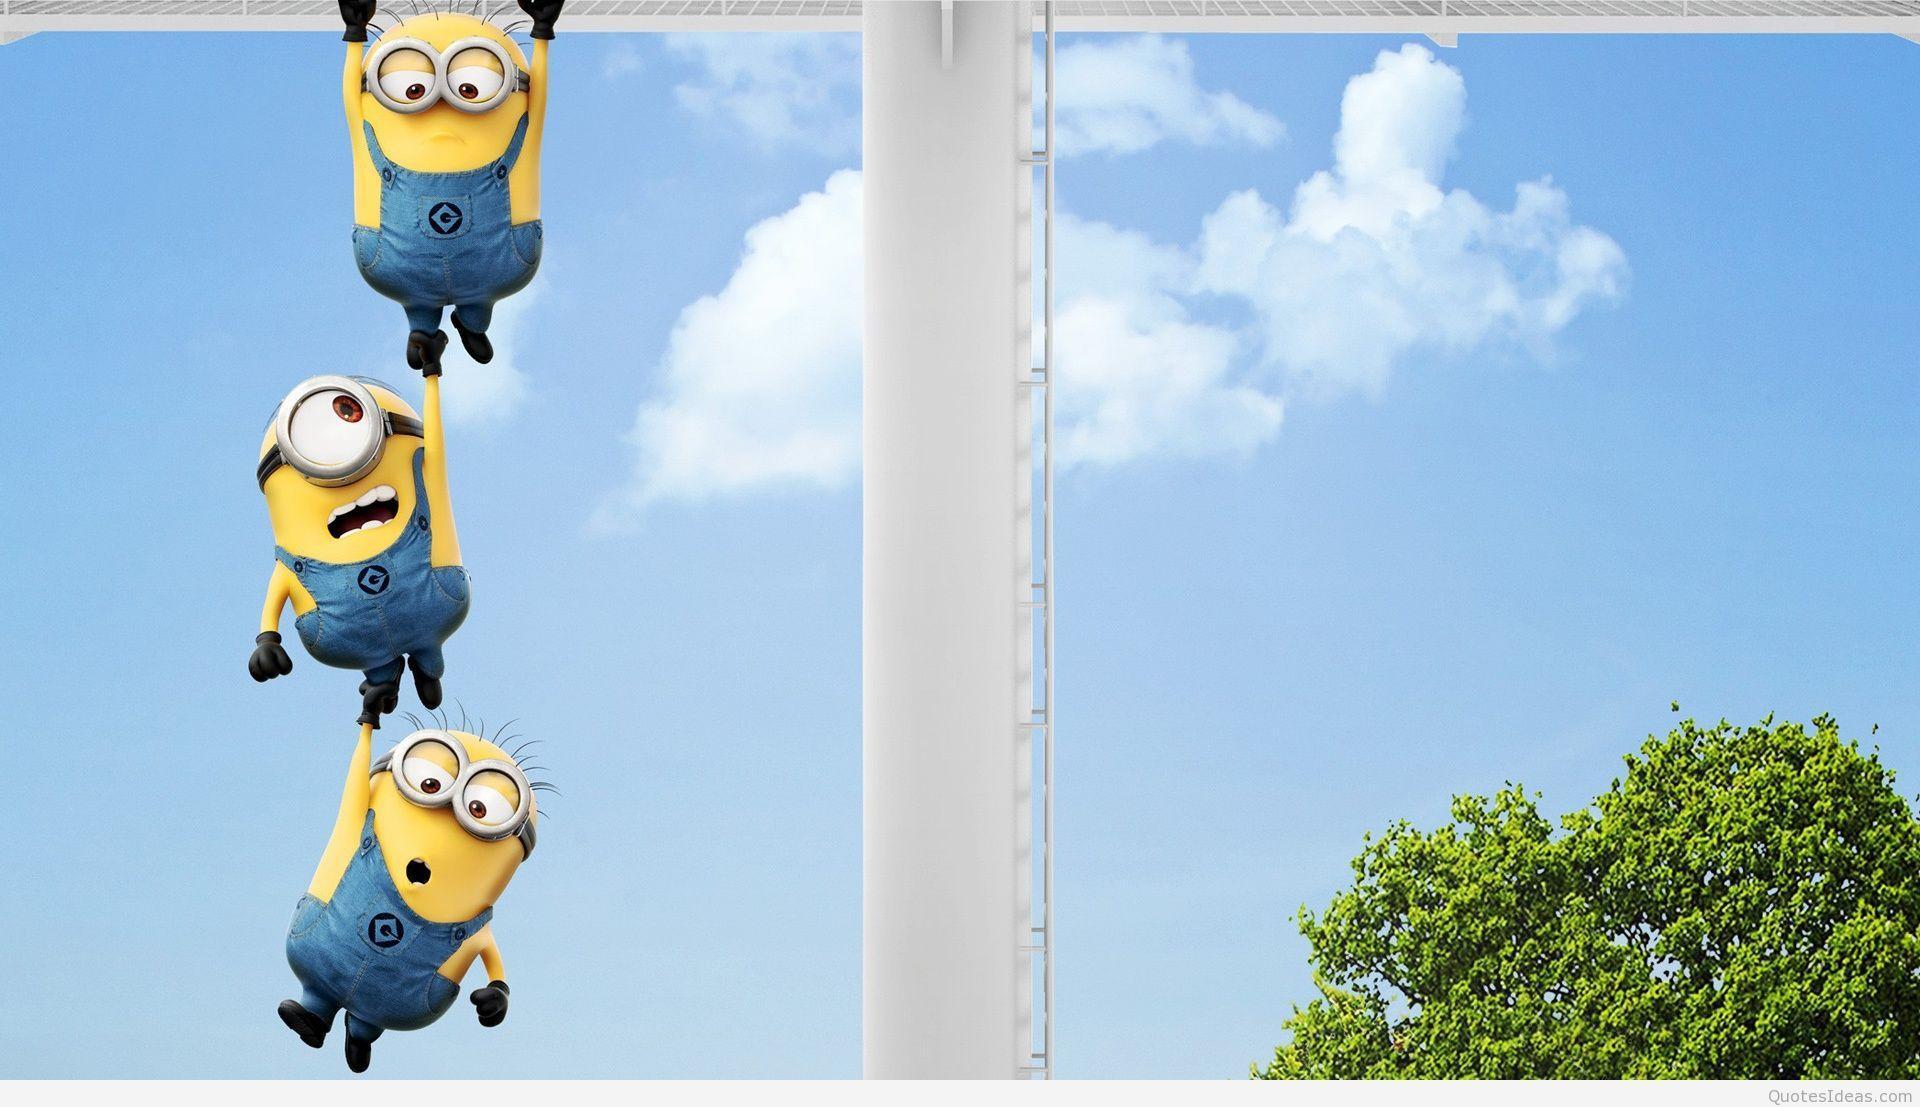 Unduh 1000 Wallpaper Android Minion